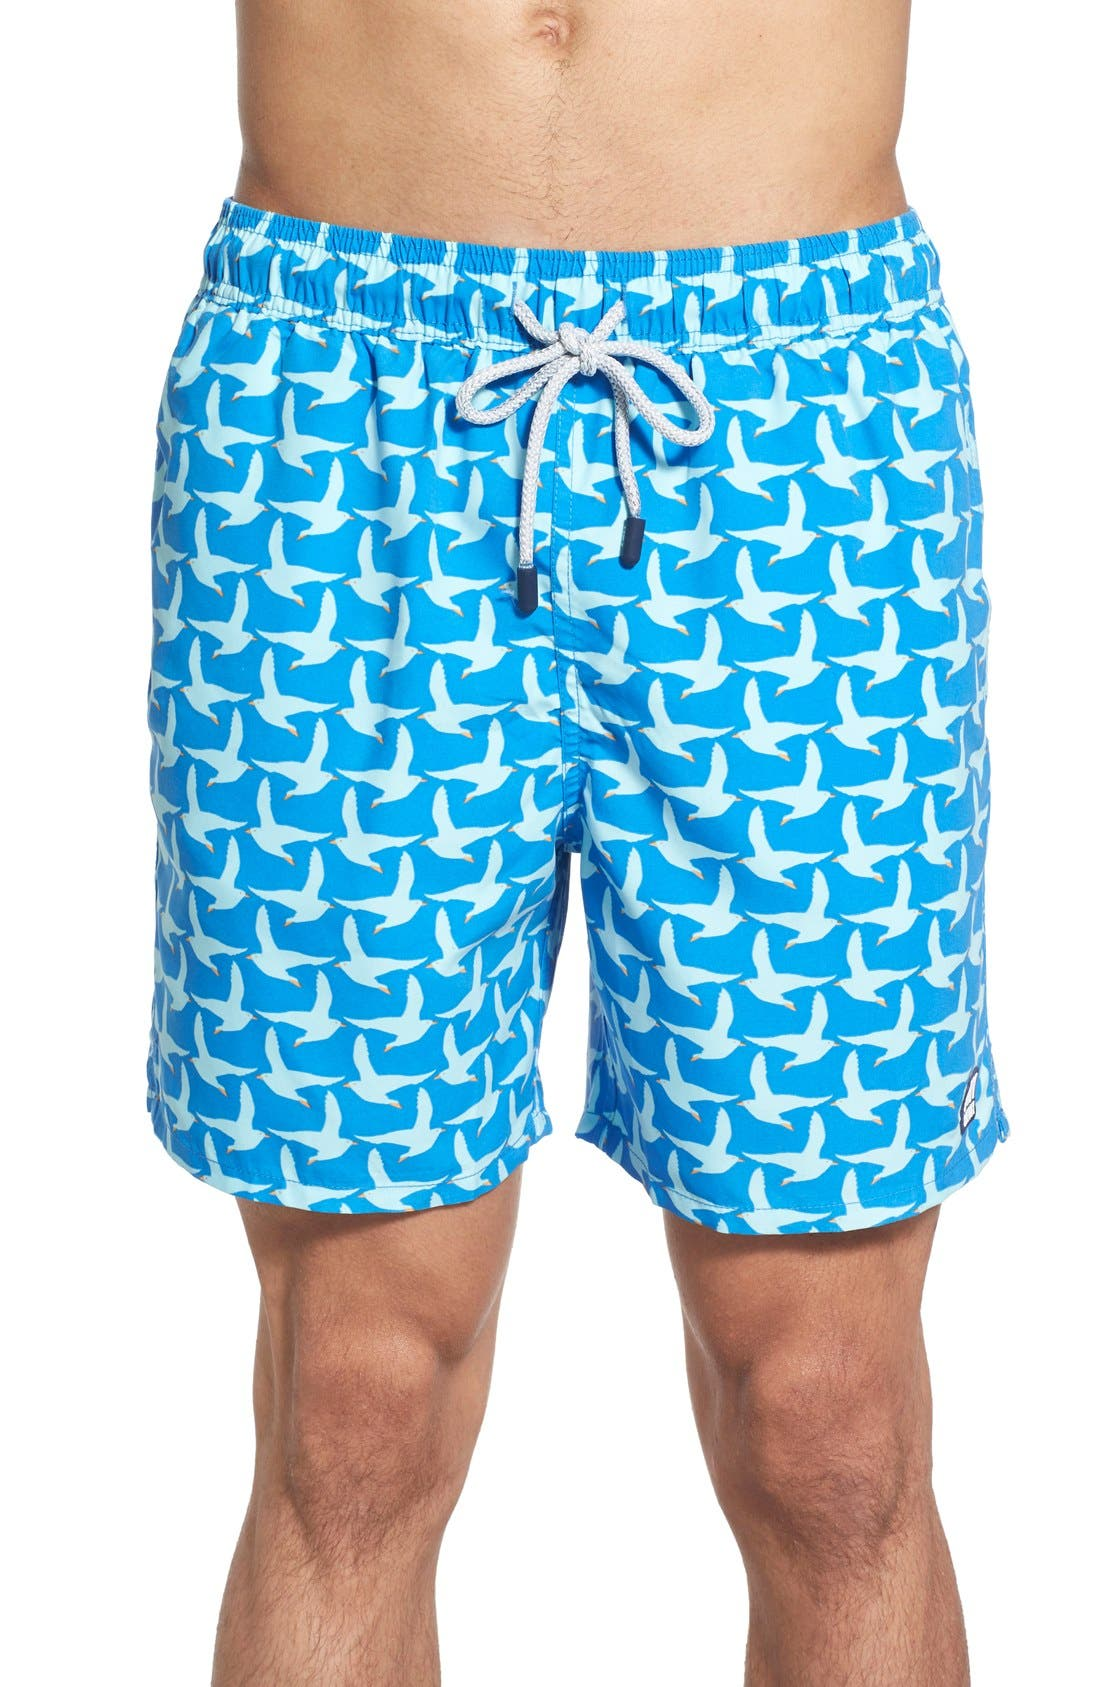 TOM & TEDDY Seagull Print Swim Trunks, Main, color, COBALT BLUE